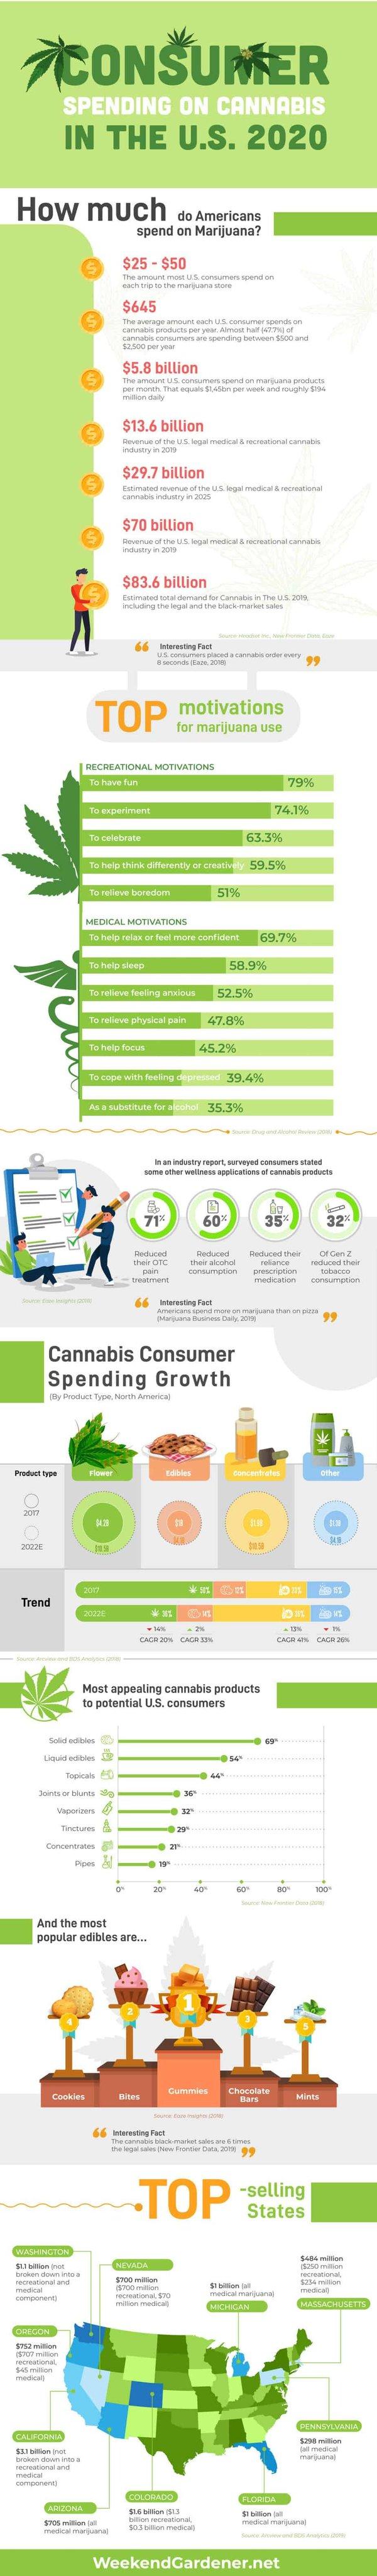 American Cannabis Consumer Spending 2020